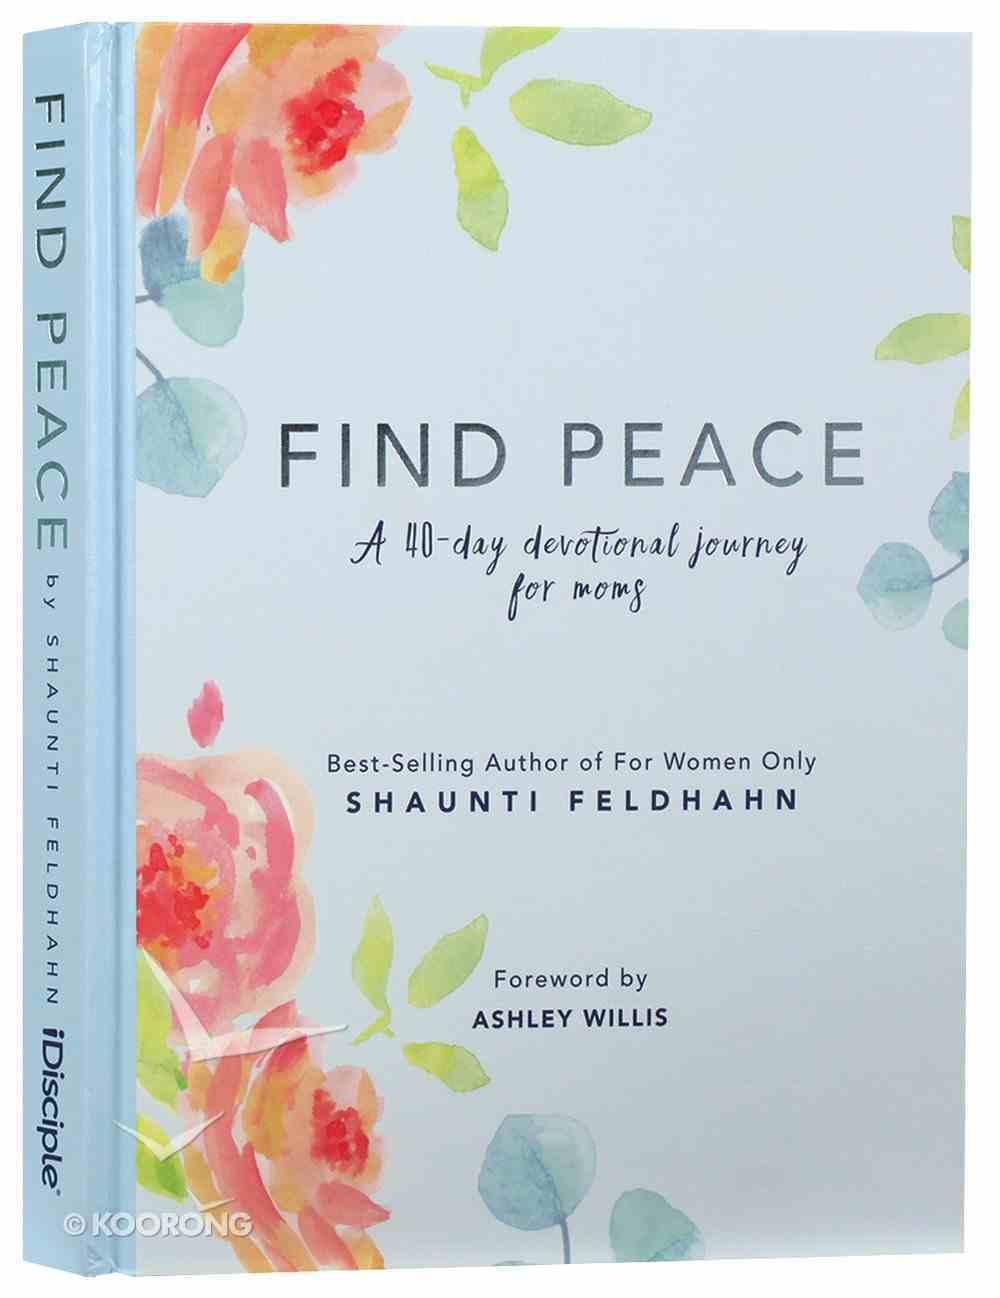 Find Peace: A 40-Day Devotional Journey For Moms Hardback